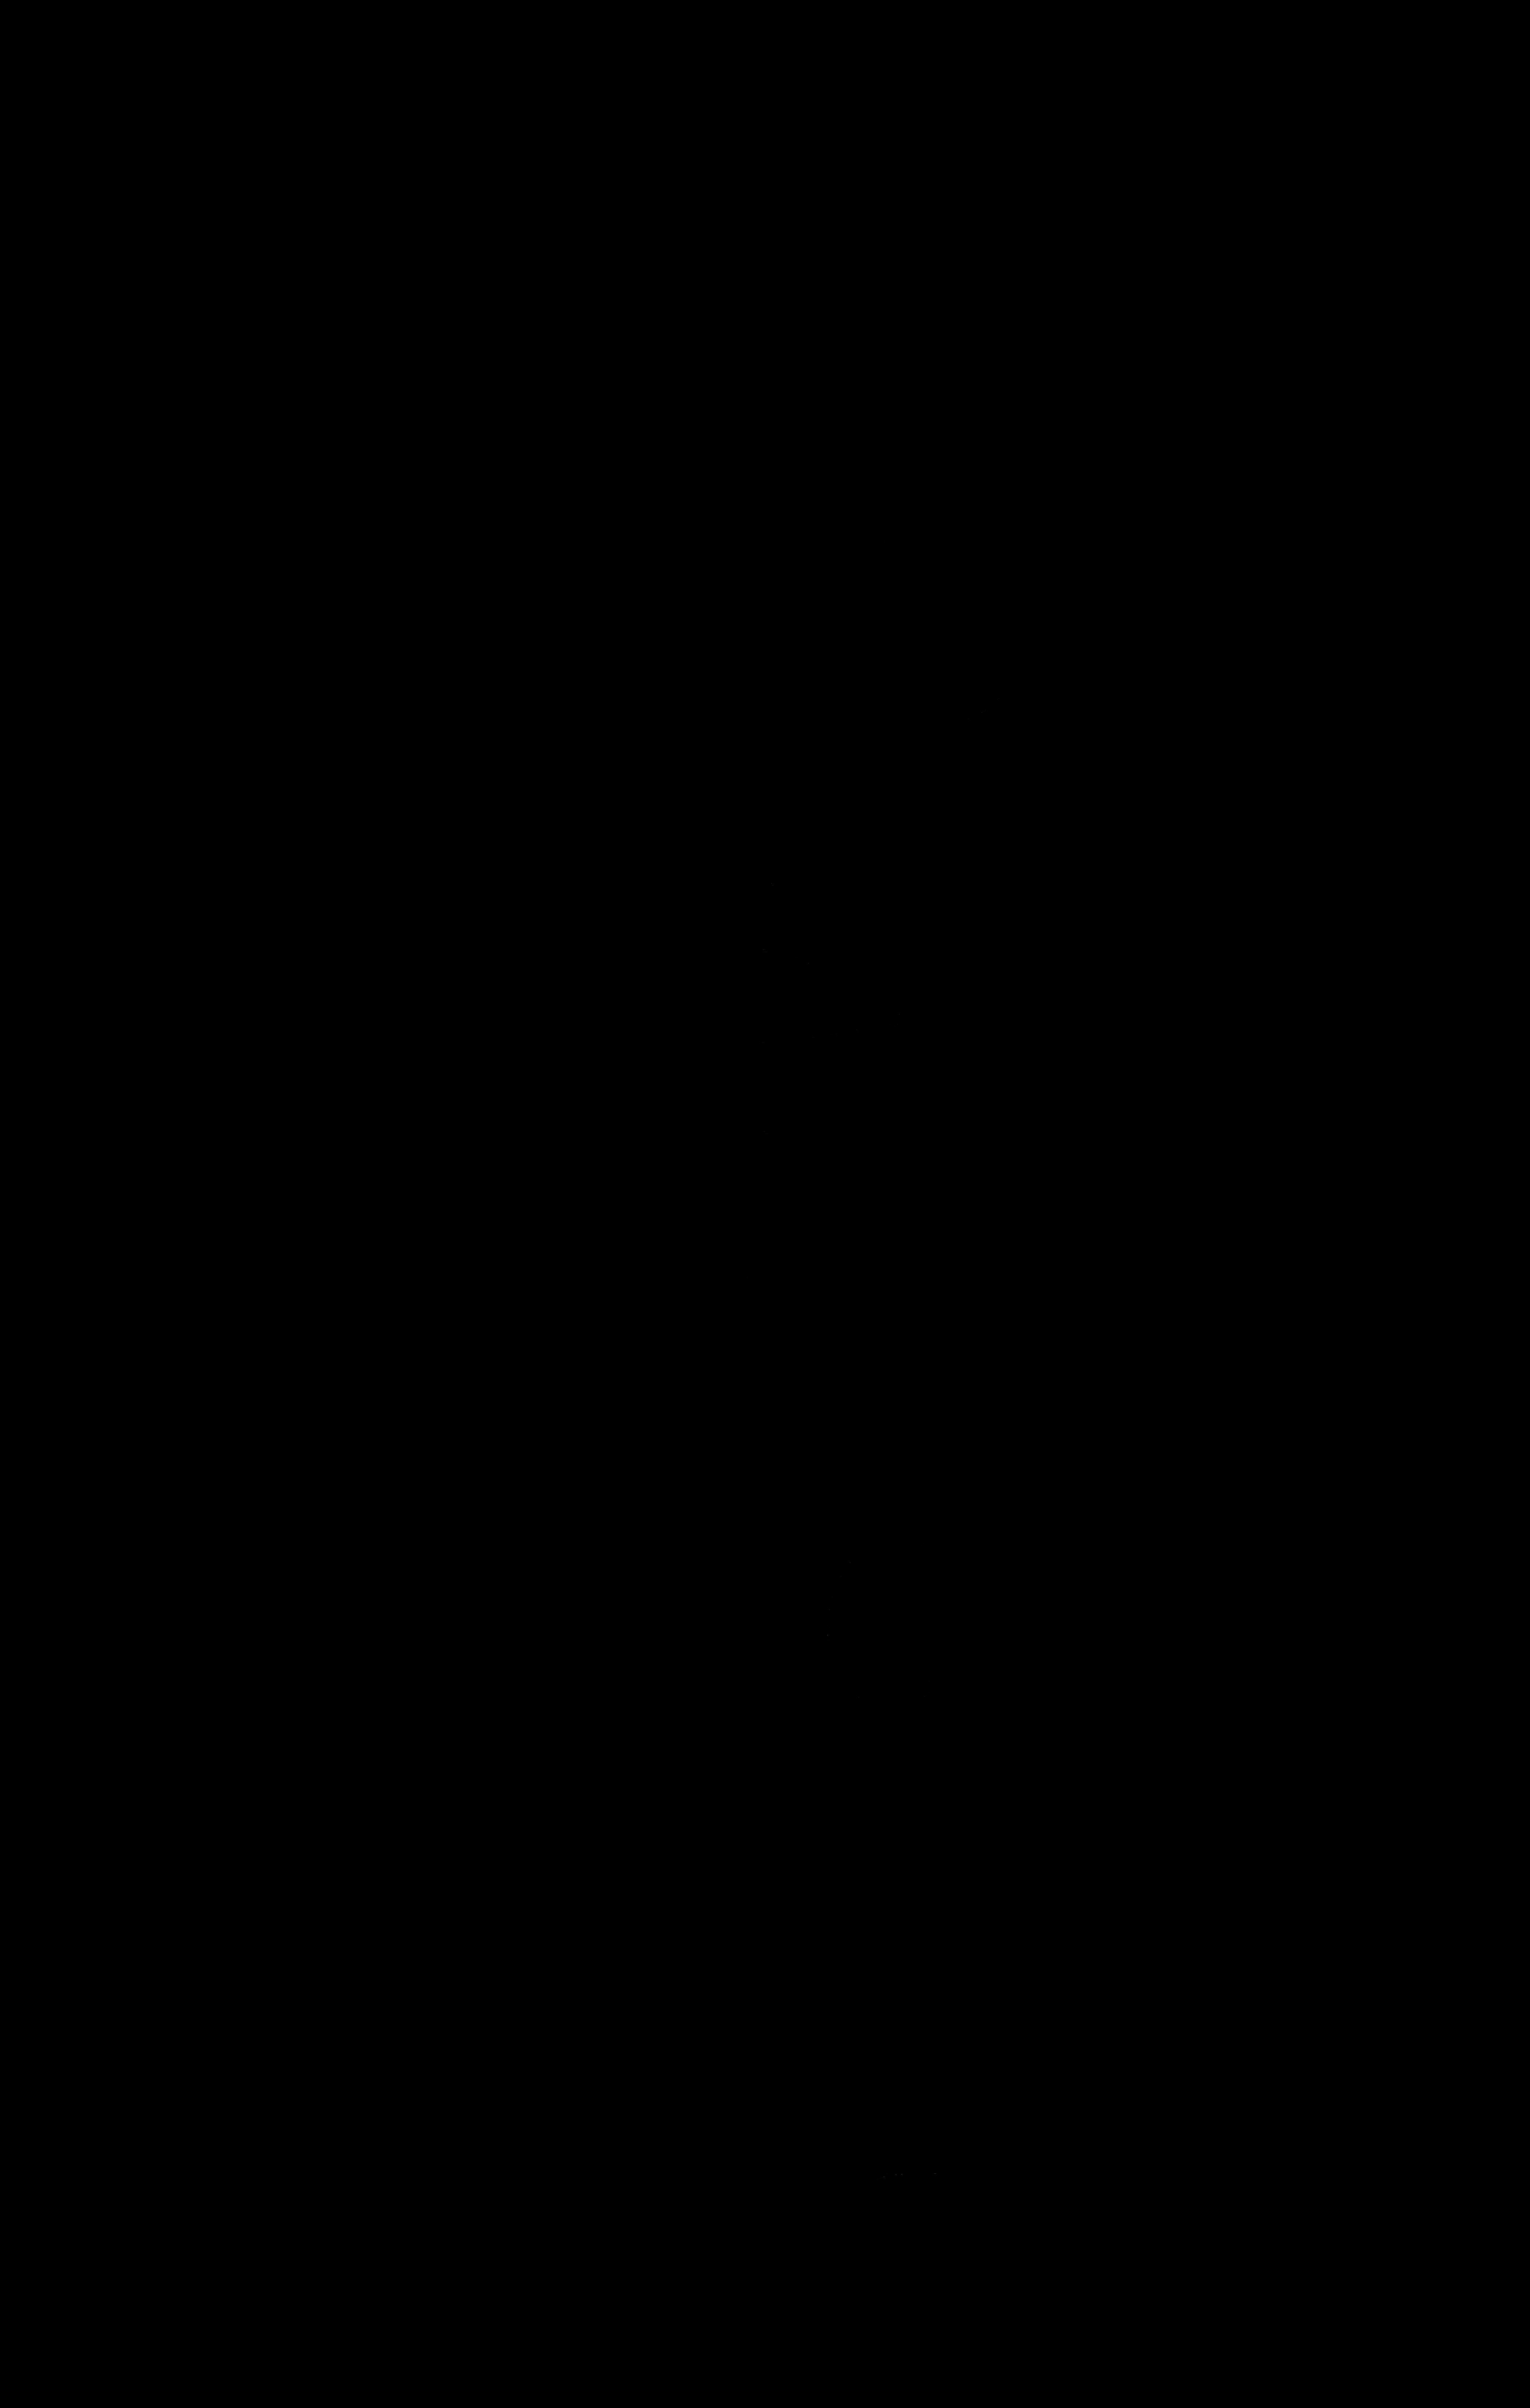 Coloriage Black Goku